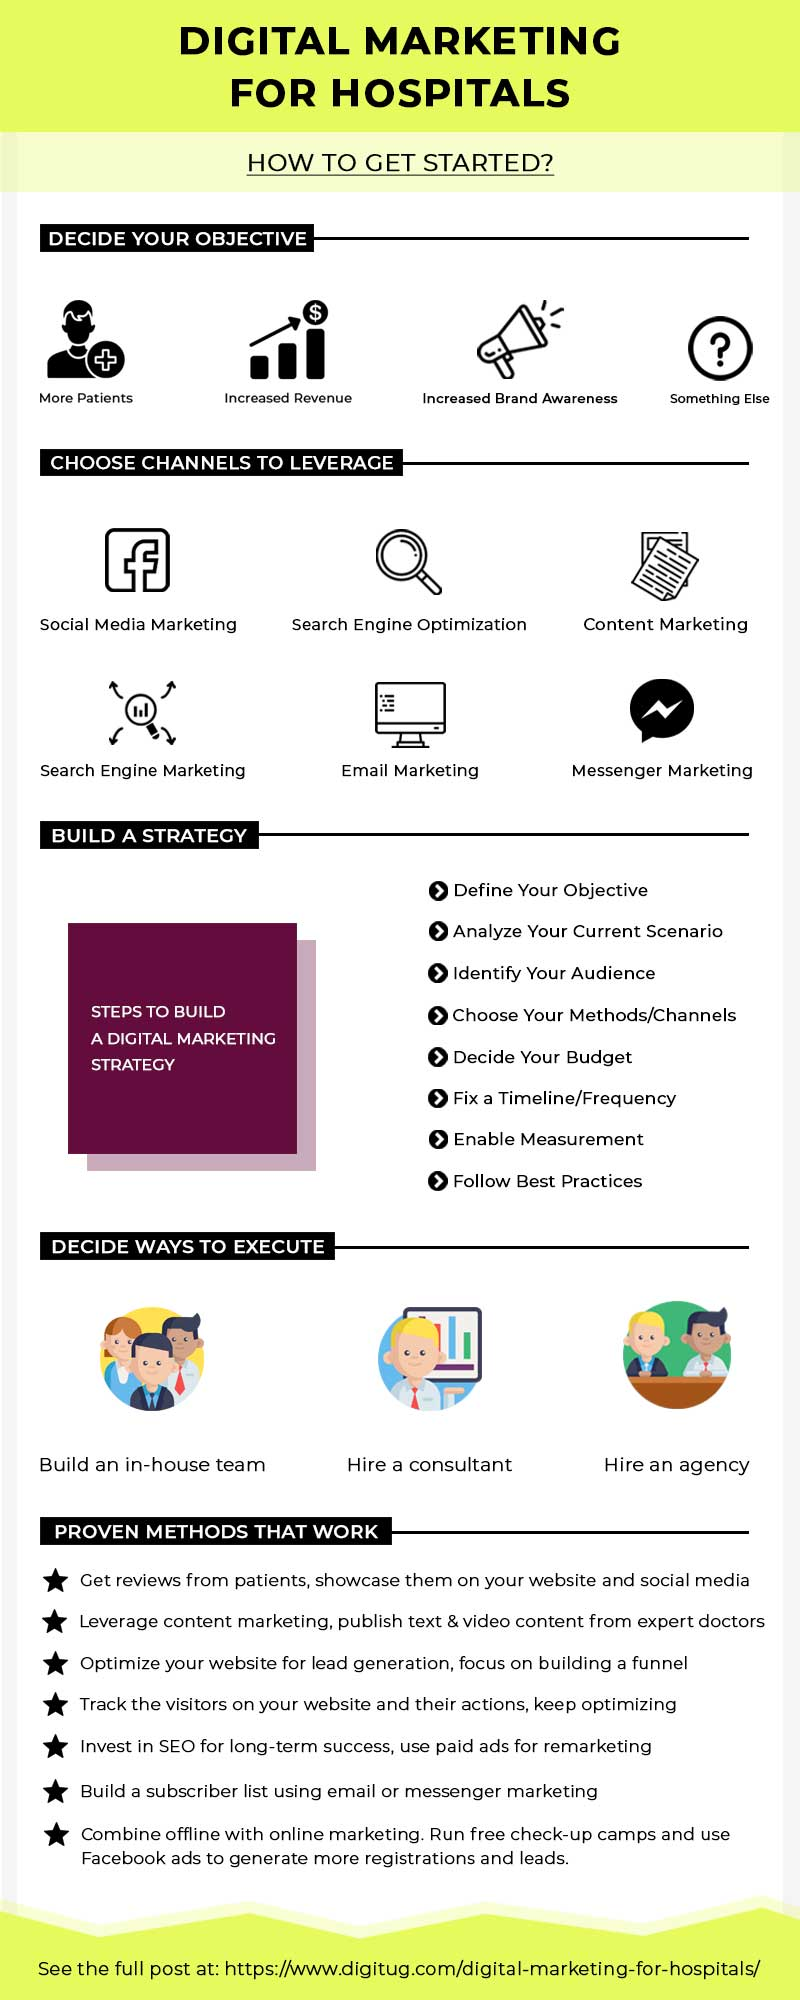 Digital Marketing for Hospitals - Infographic